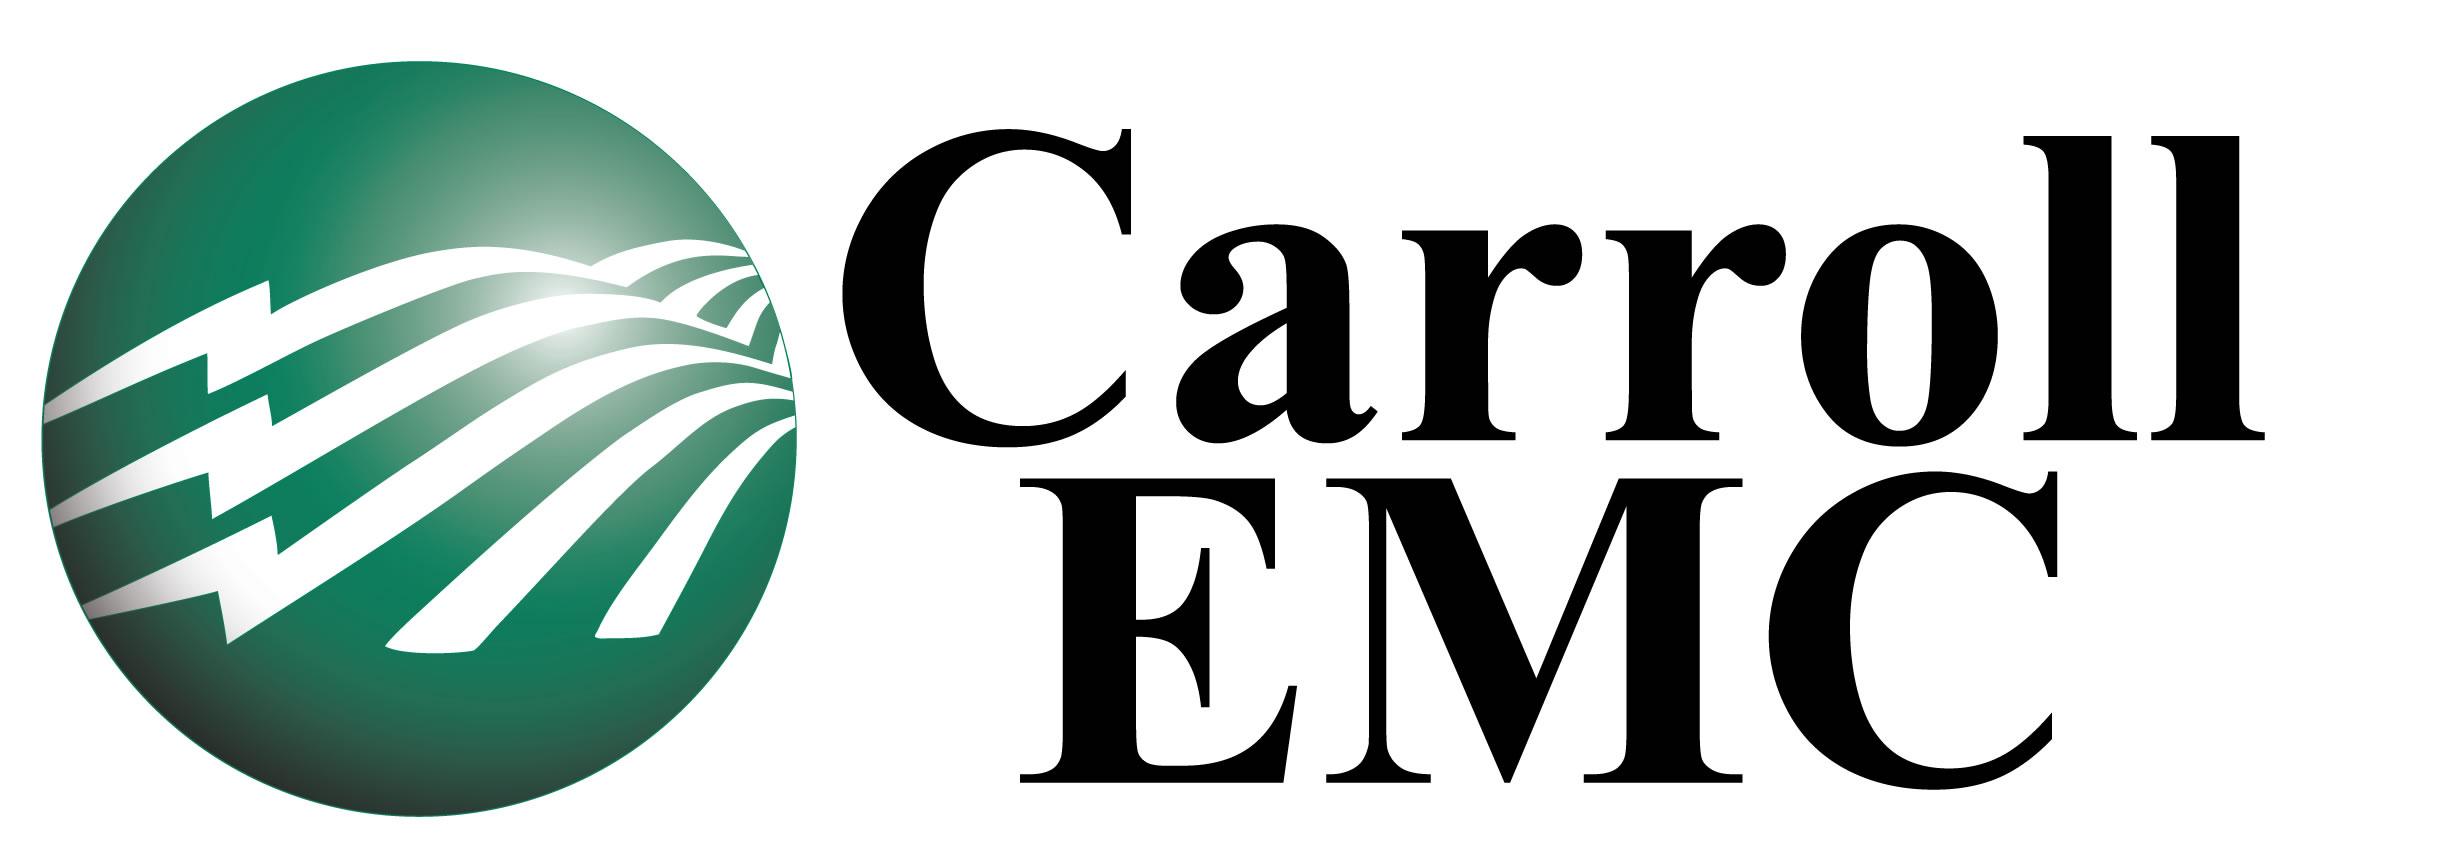 Carroll Electric Membership Cooperative Company Logo